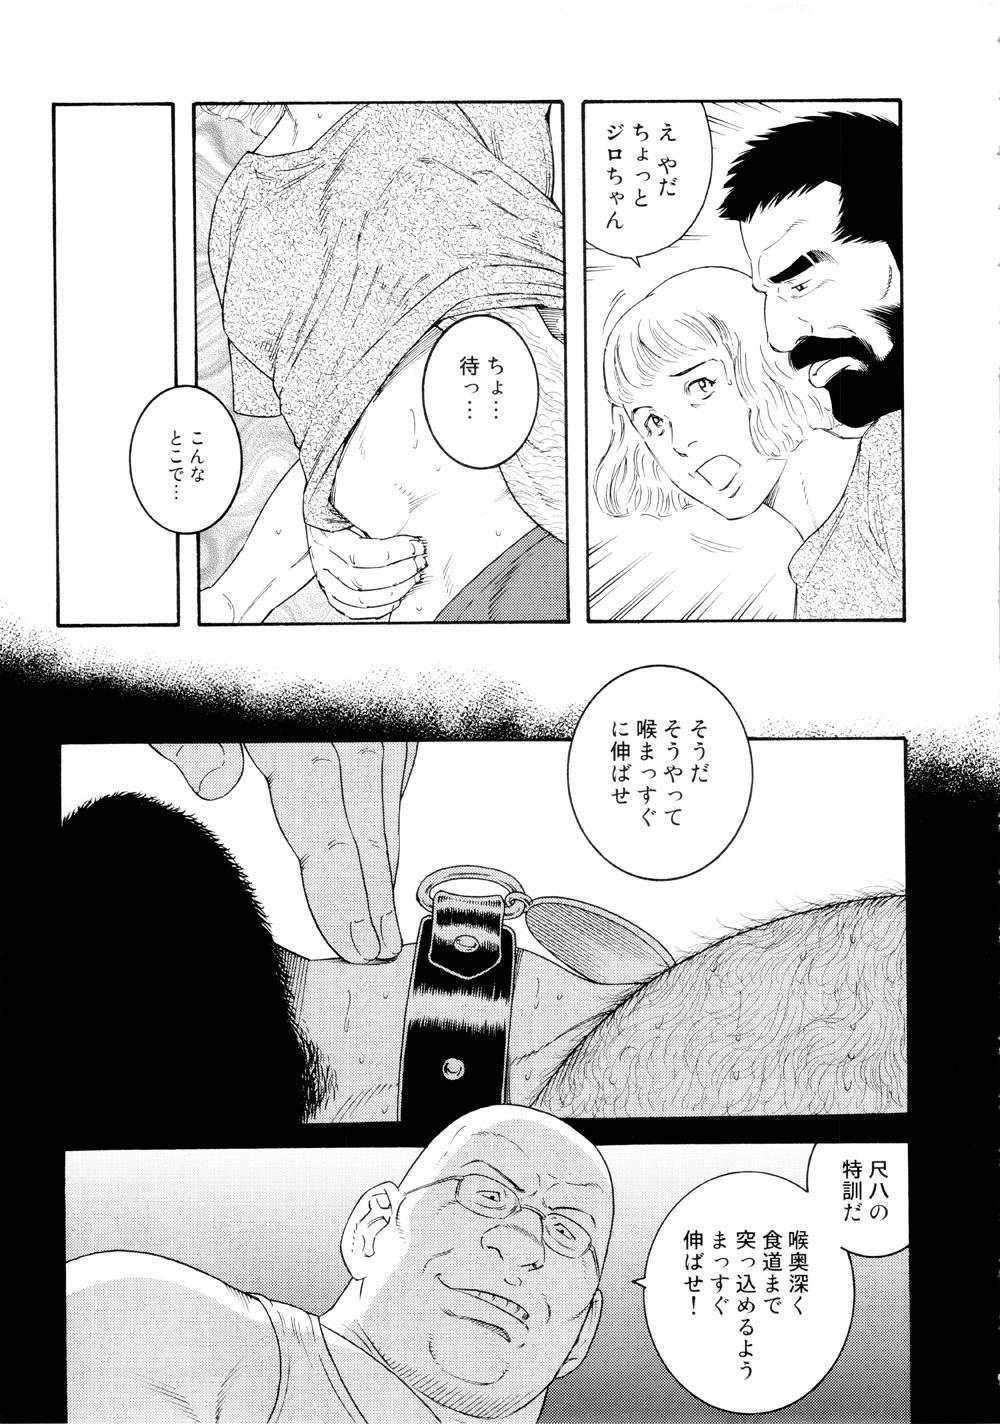 Genryu Chapter 2 2